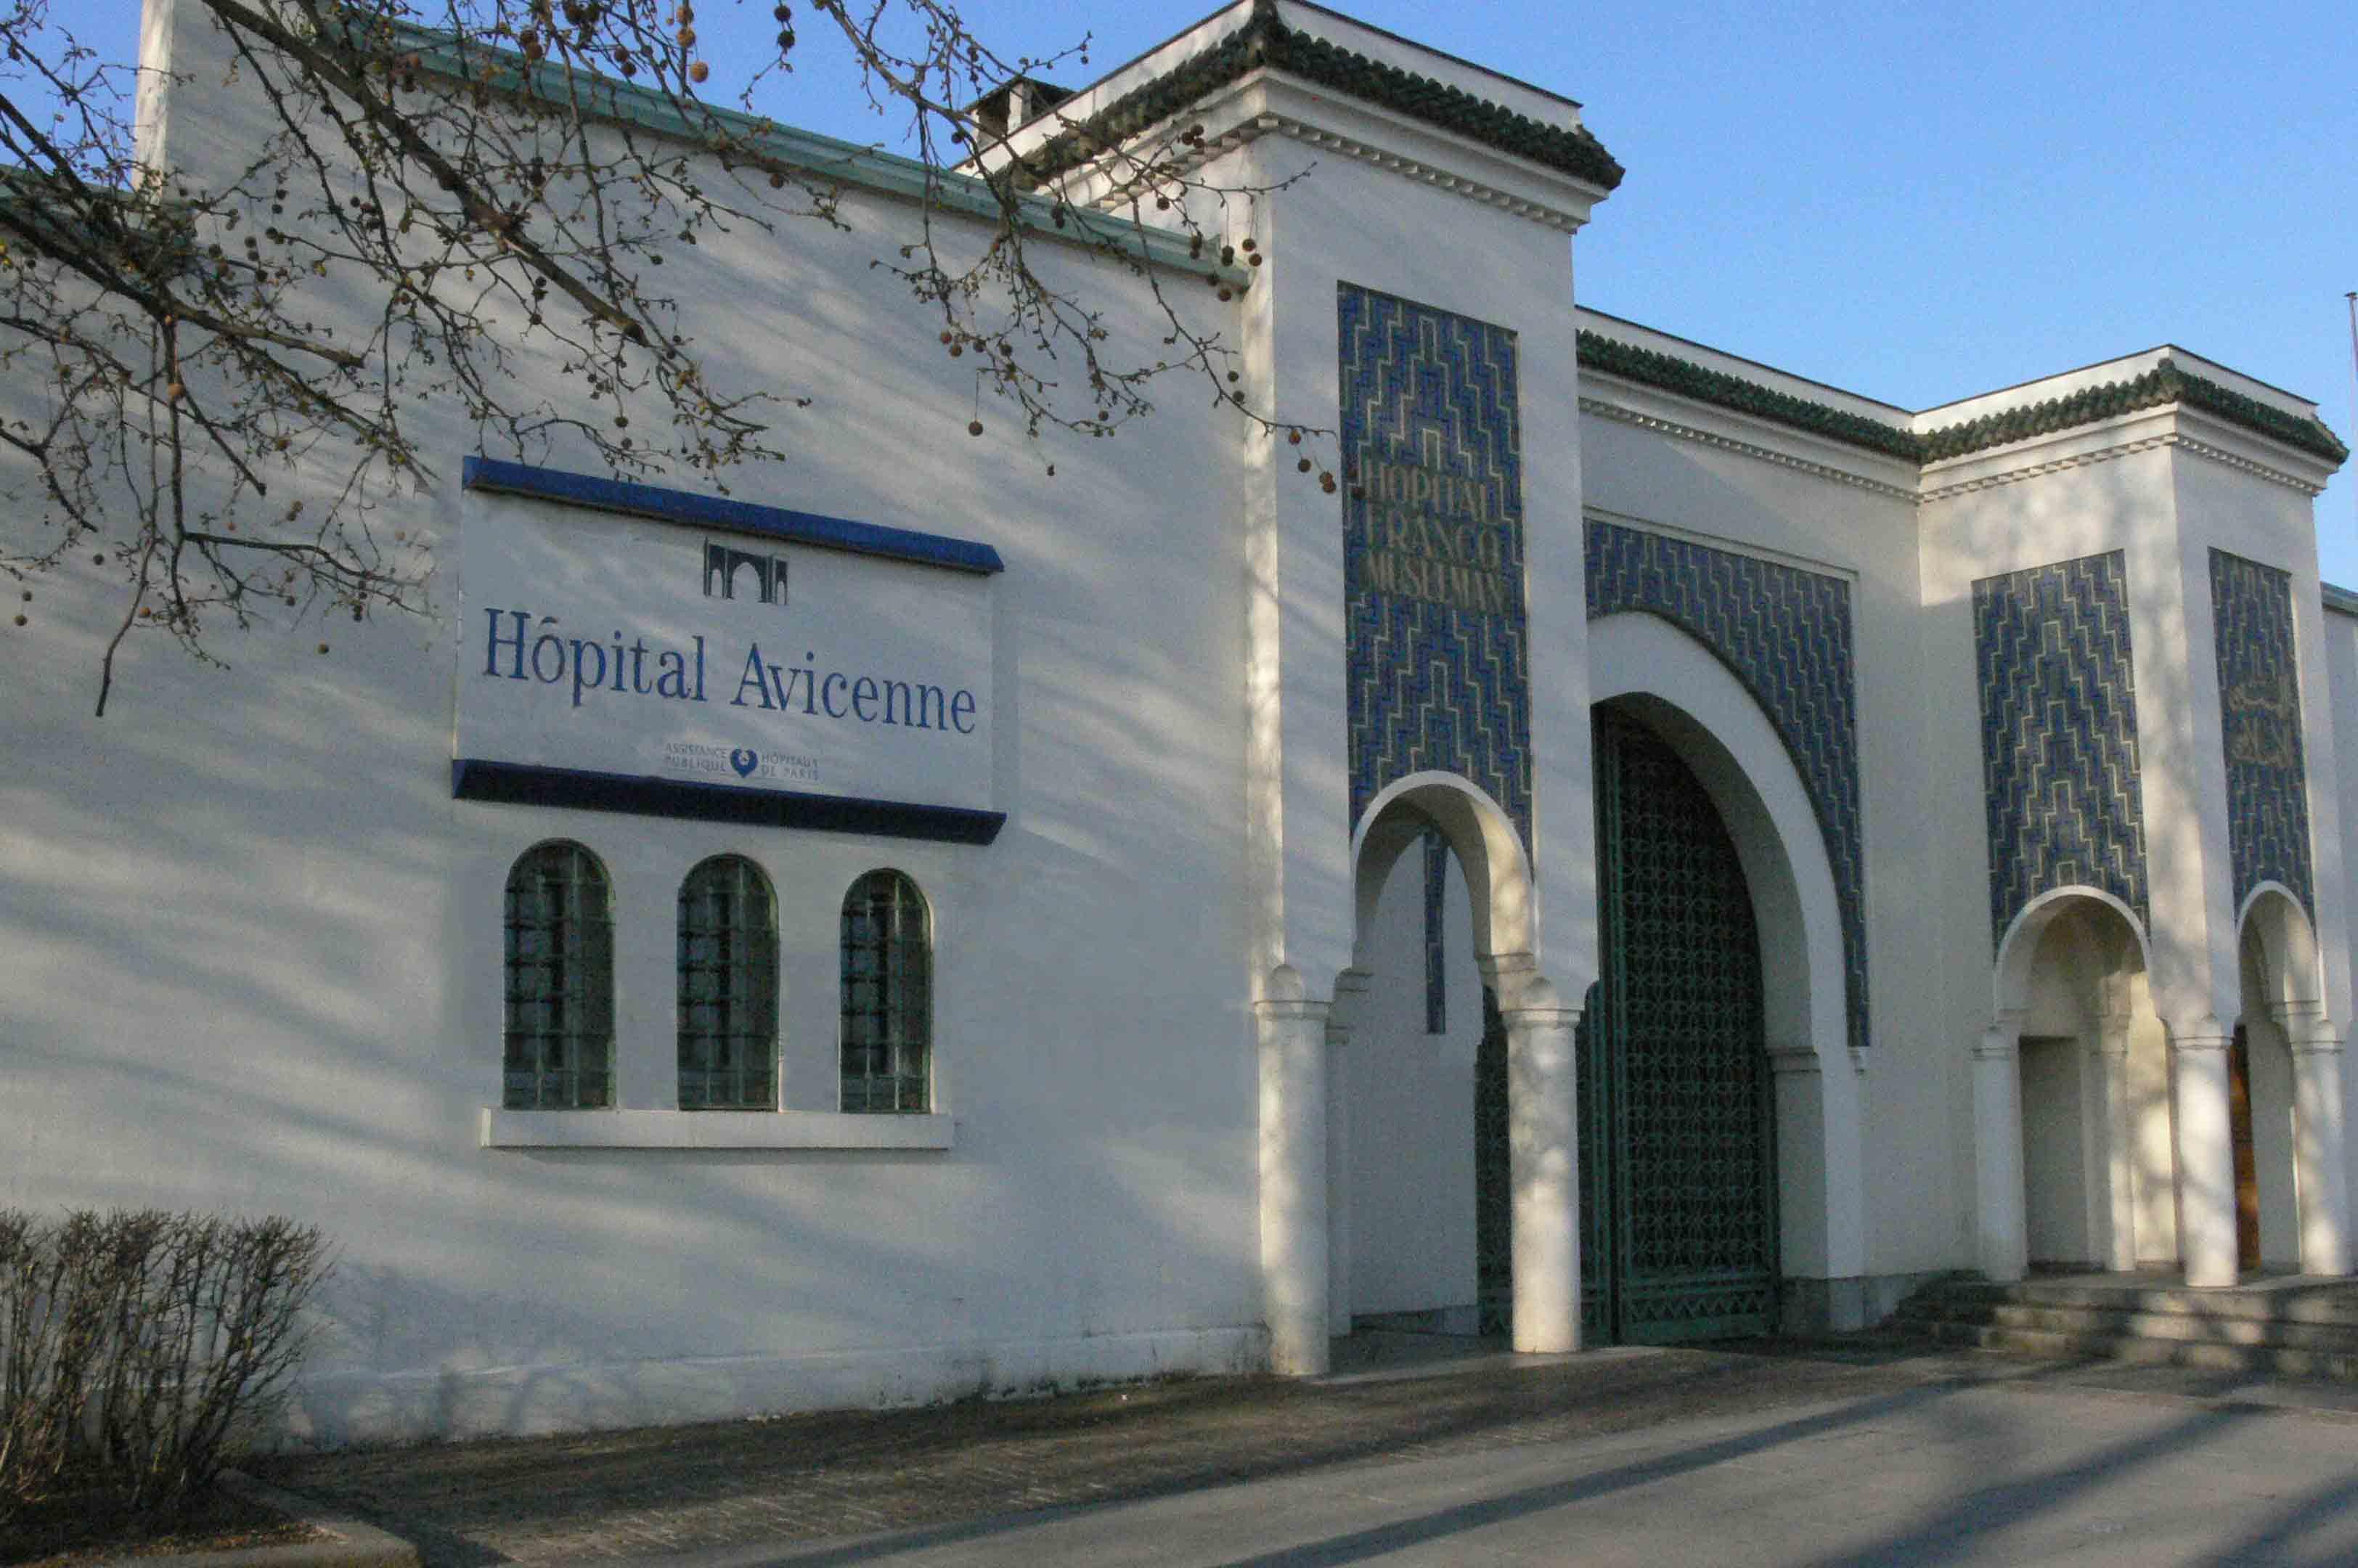 Hôpital Avicenne - Hôpitaux Universitaires Paris Seine-Saint-Denis (Bobigny)